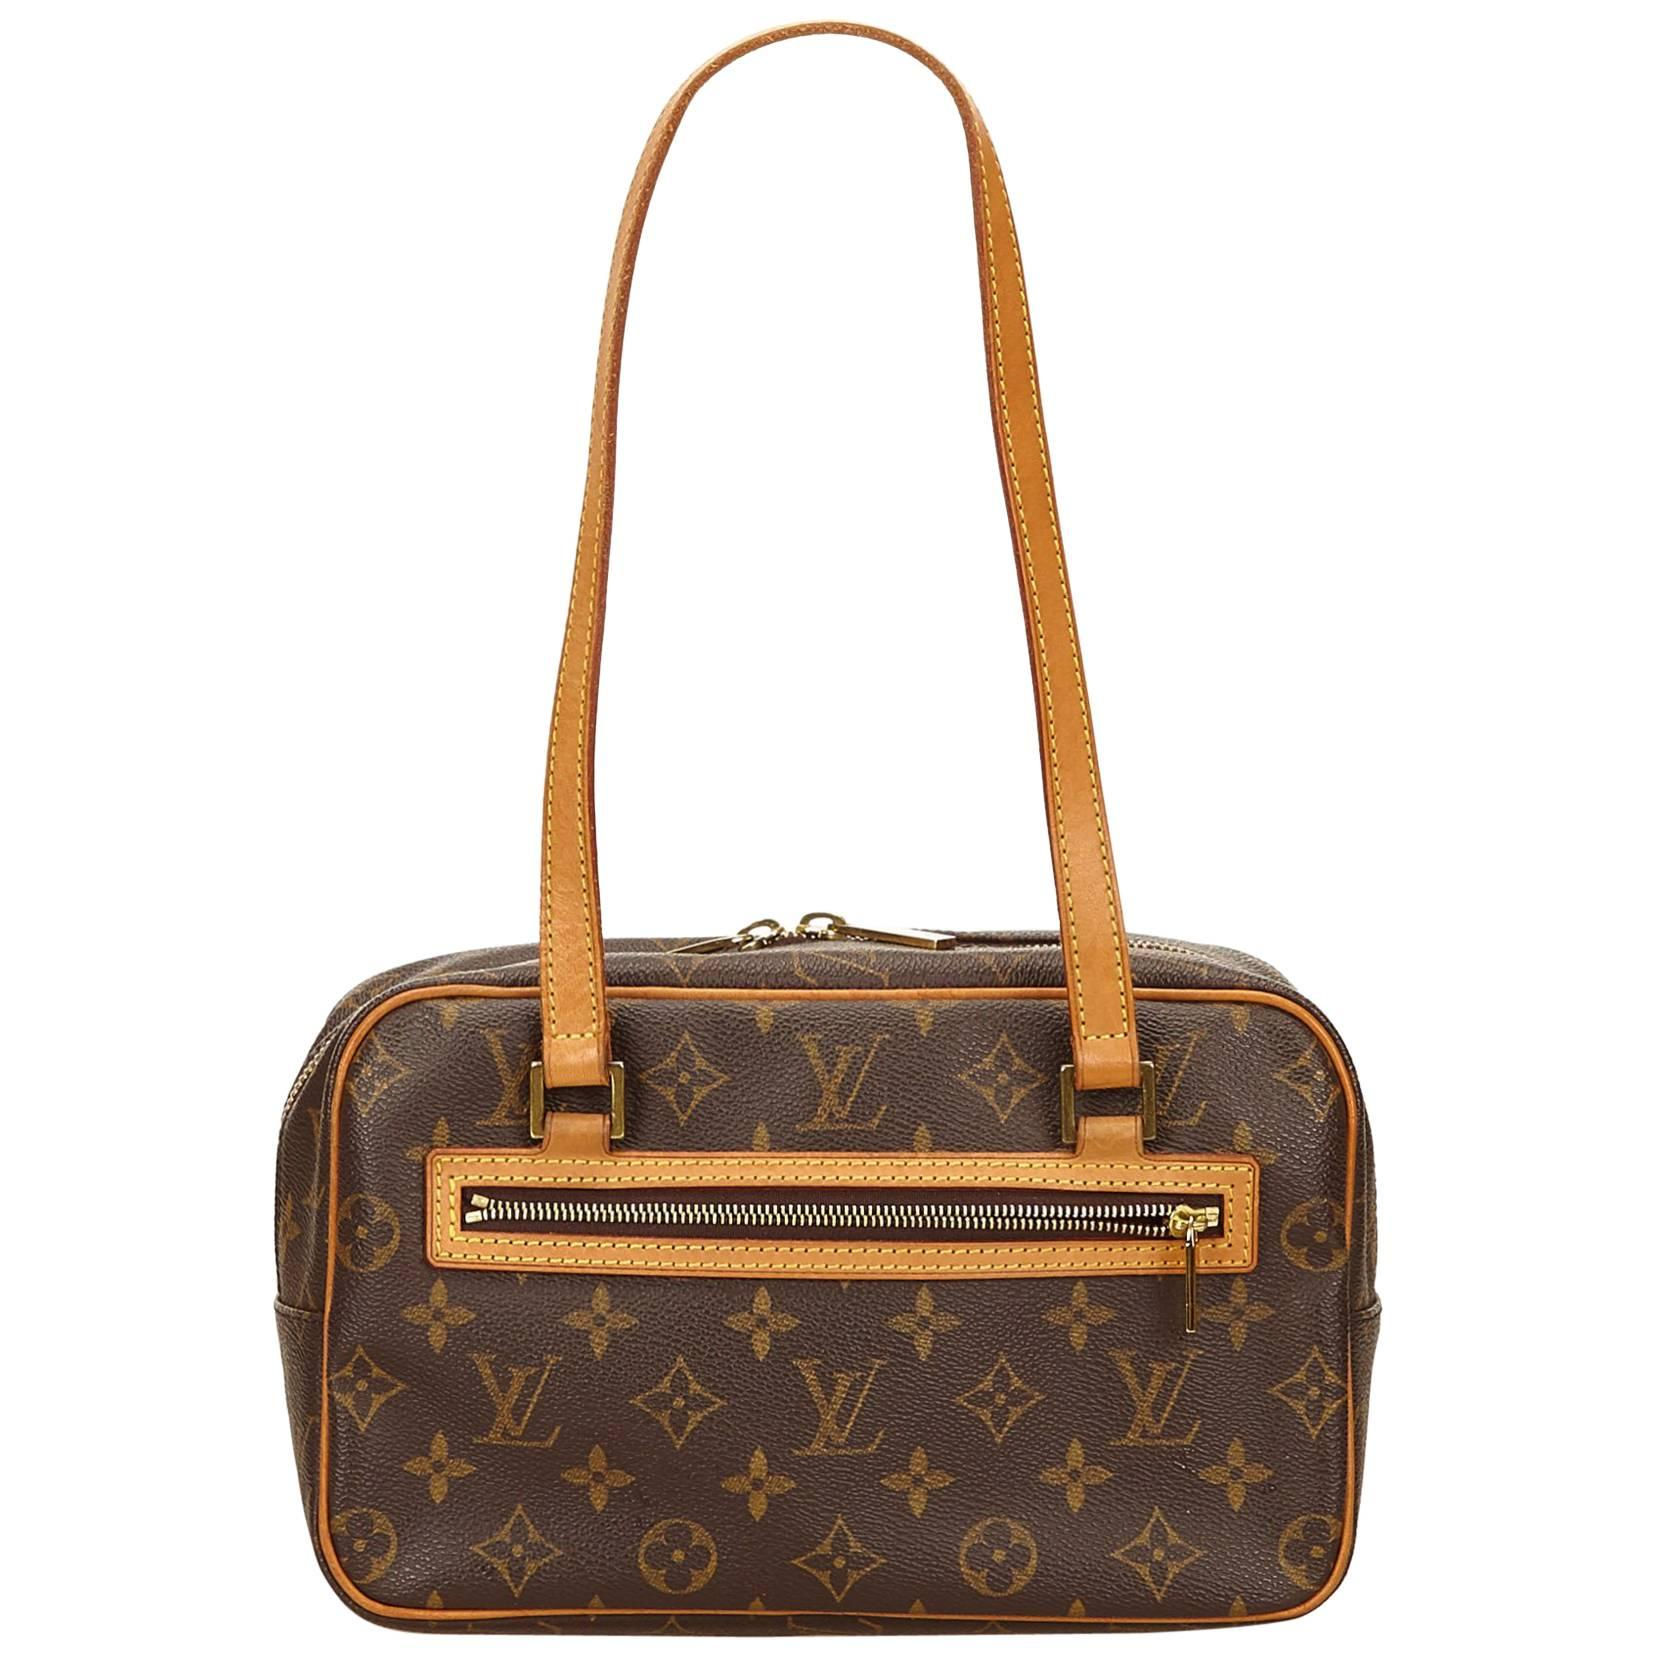 Louis Vuitton Cartouchière Bag In Brown Monogram Canvas And Natural Leather 4voF5P8